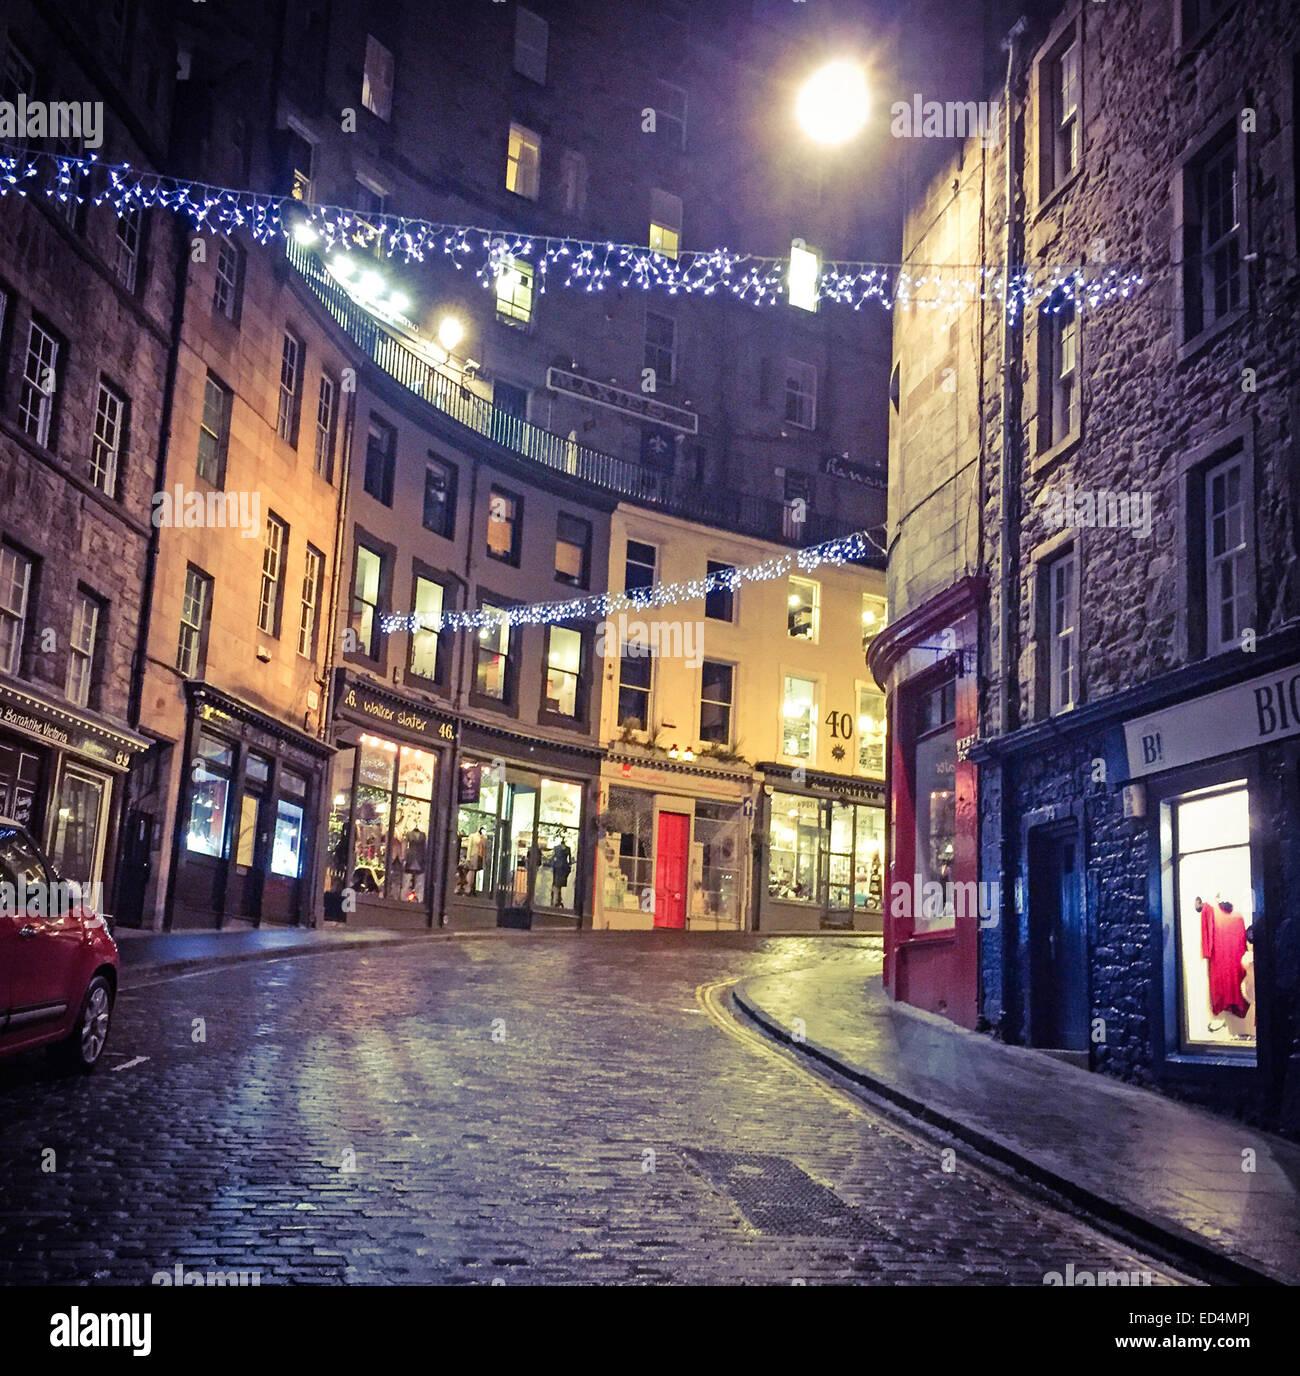 Street,Scottish,building,Street,with,historic,architecture,elegant,curve,colourful,shop,fronts,is,one,of,the,city's,most,picturesque,location,old,West,Bow,Grassmarket,to,Castlehill,Lothian,Scotland,UK,Edinburgh,tourist,trail,track,tourism,night,dusk,shiny,cobbles,cobbled,road,lane,gotonysmith buildings tourists history,Buy Pictures of,Buy Images Of,Scotlands History,Scotlands History